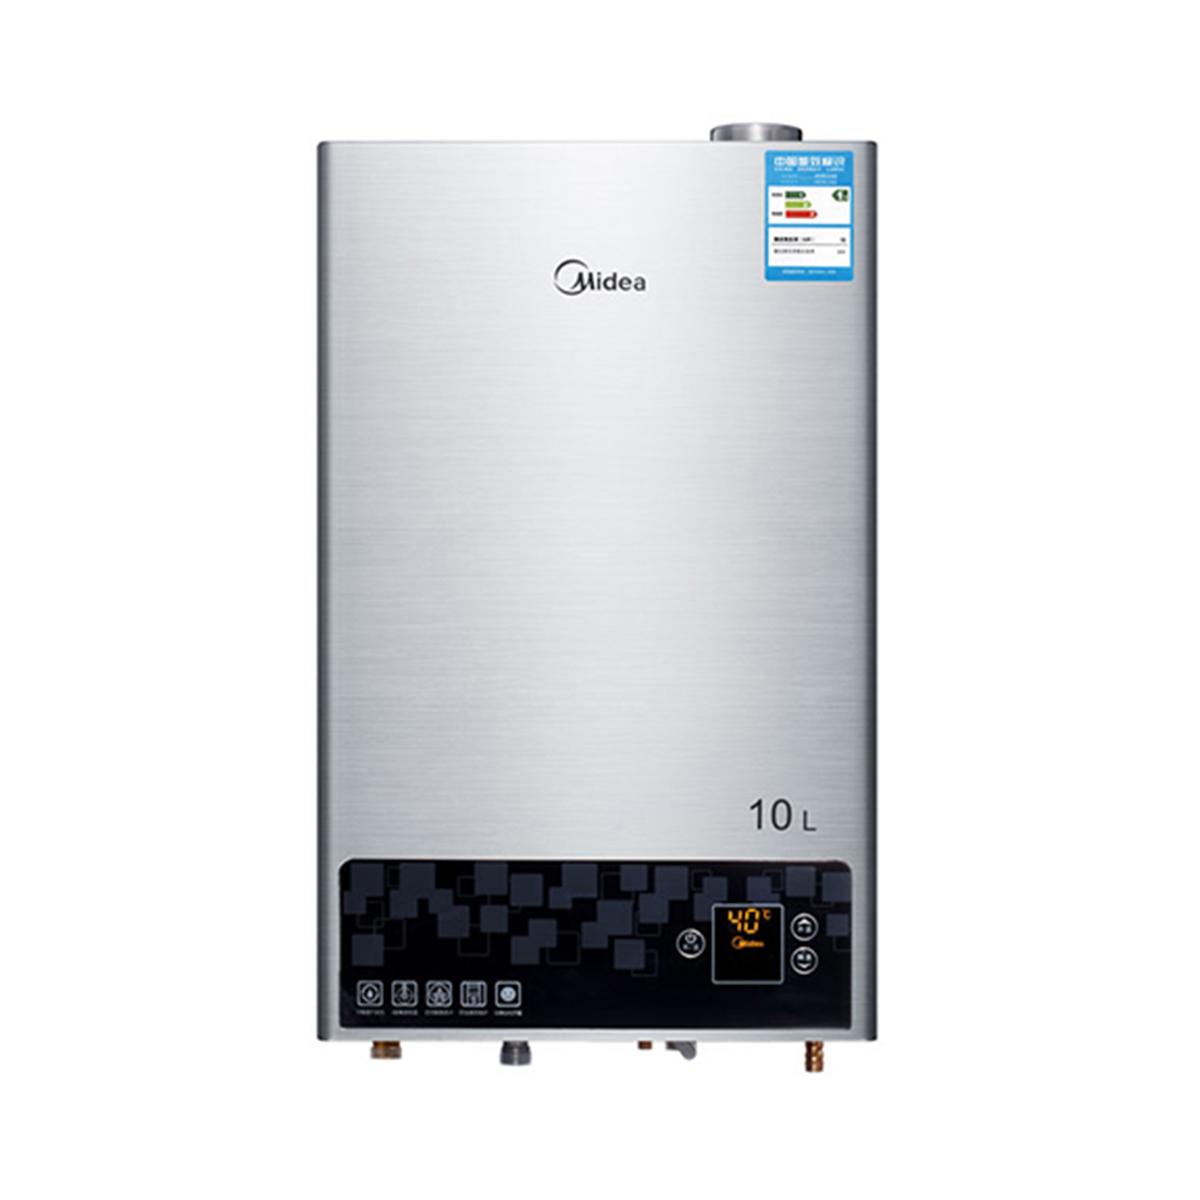 Midea/美的 JSQ18-10LE(T)燃气热水器 说明书.pdf